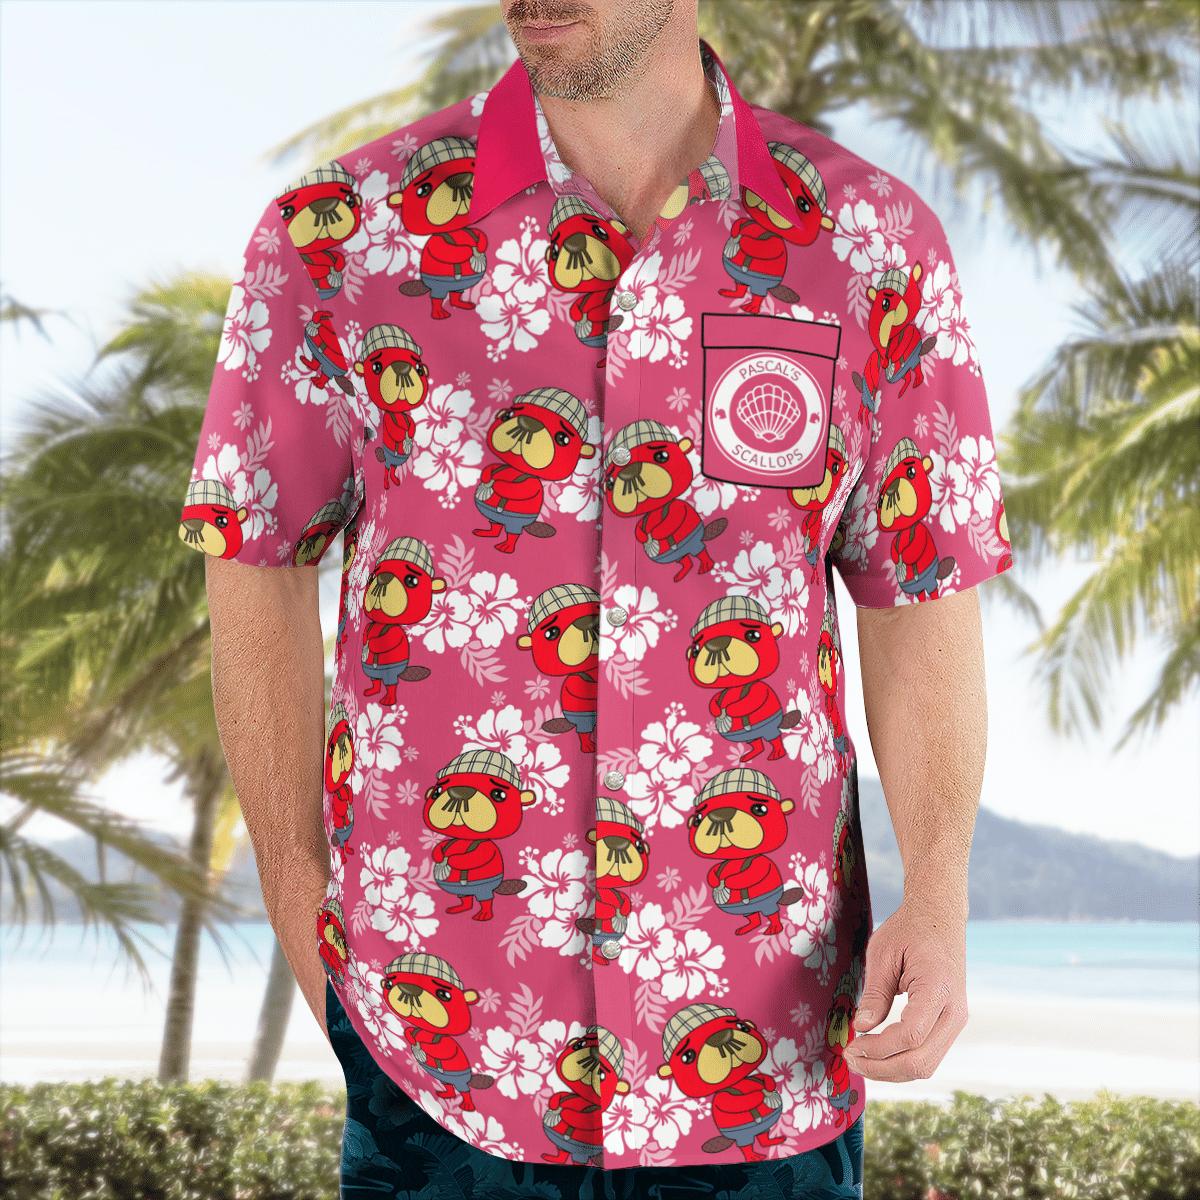 Pascal Scallop Hawaiian shirt2